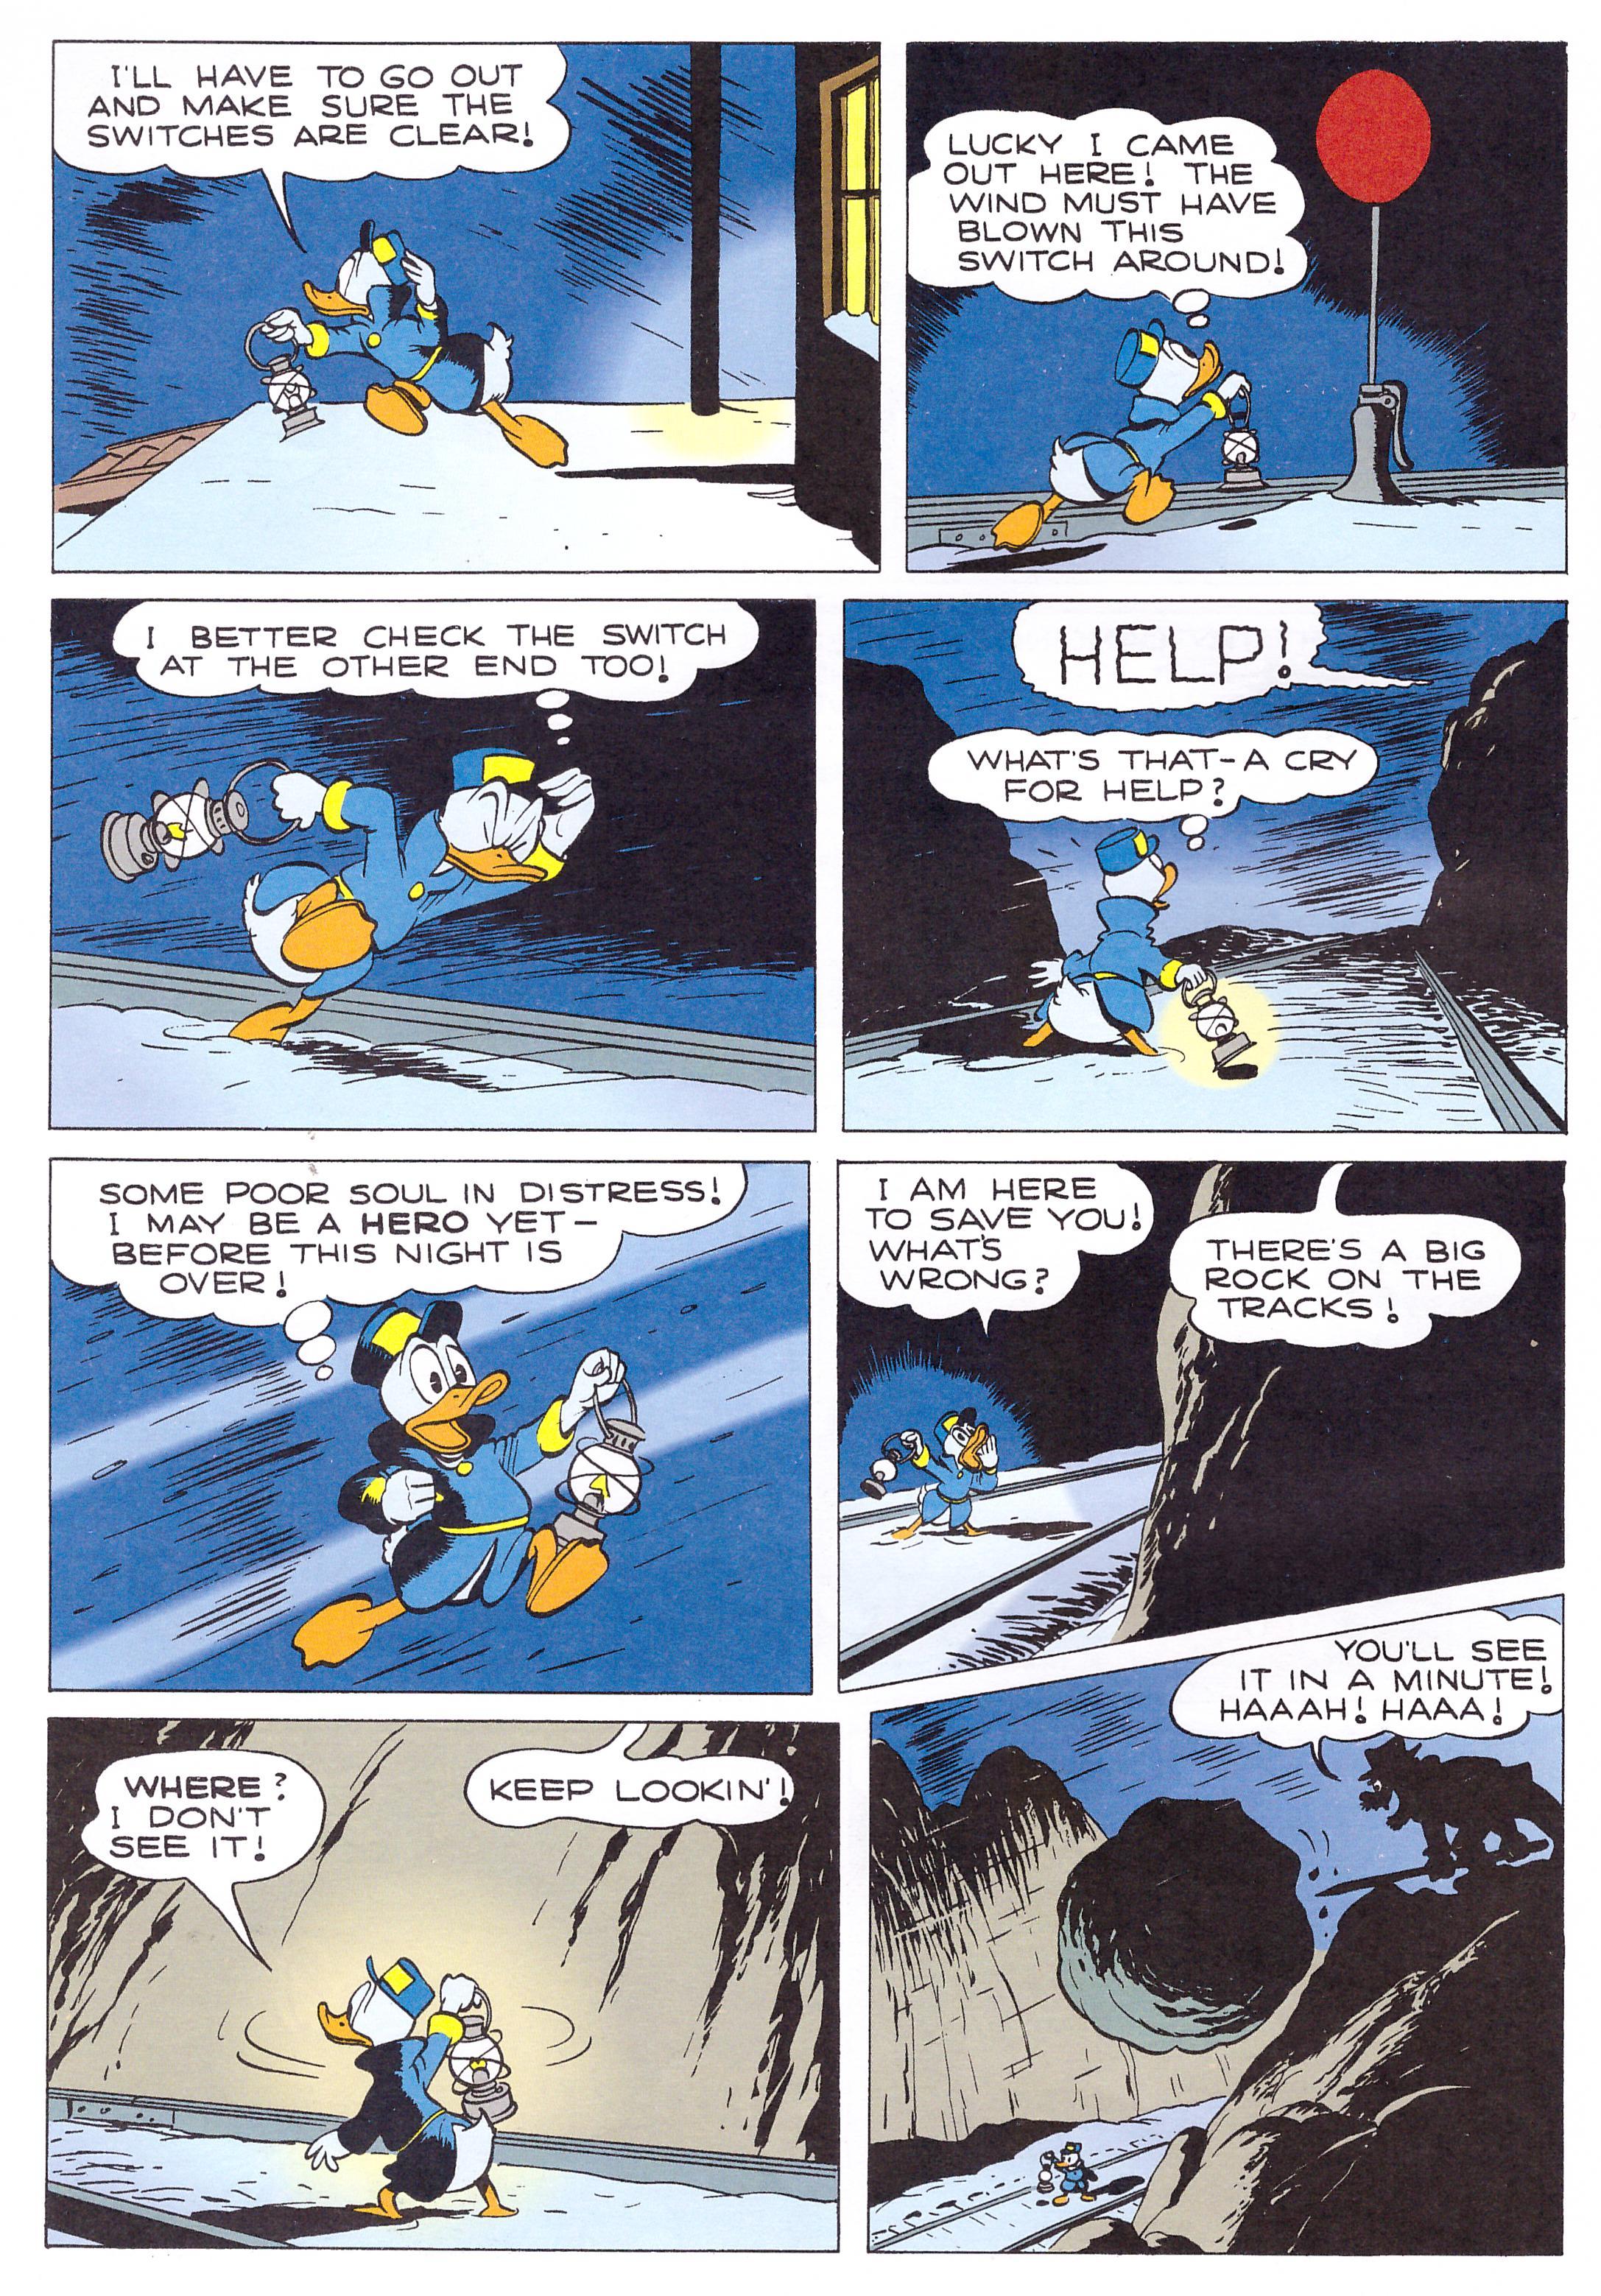 Walt Disney Comics & Stories by Carl Barks 25 review